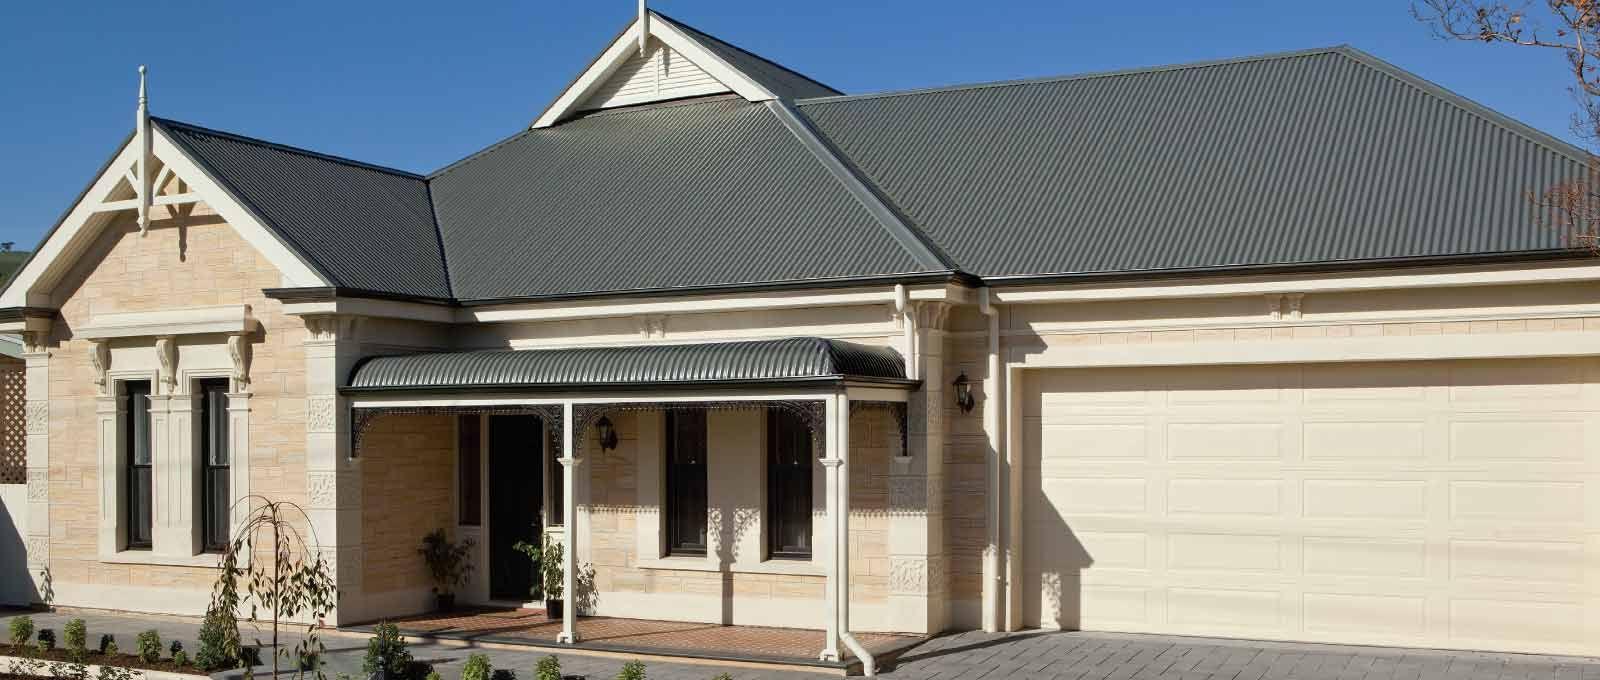 Image Result For Woodland Grey Roof Cream Coloured Bricks